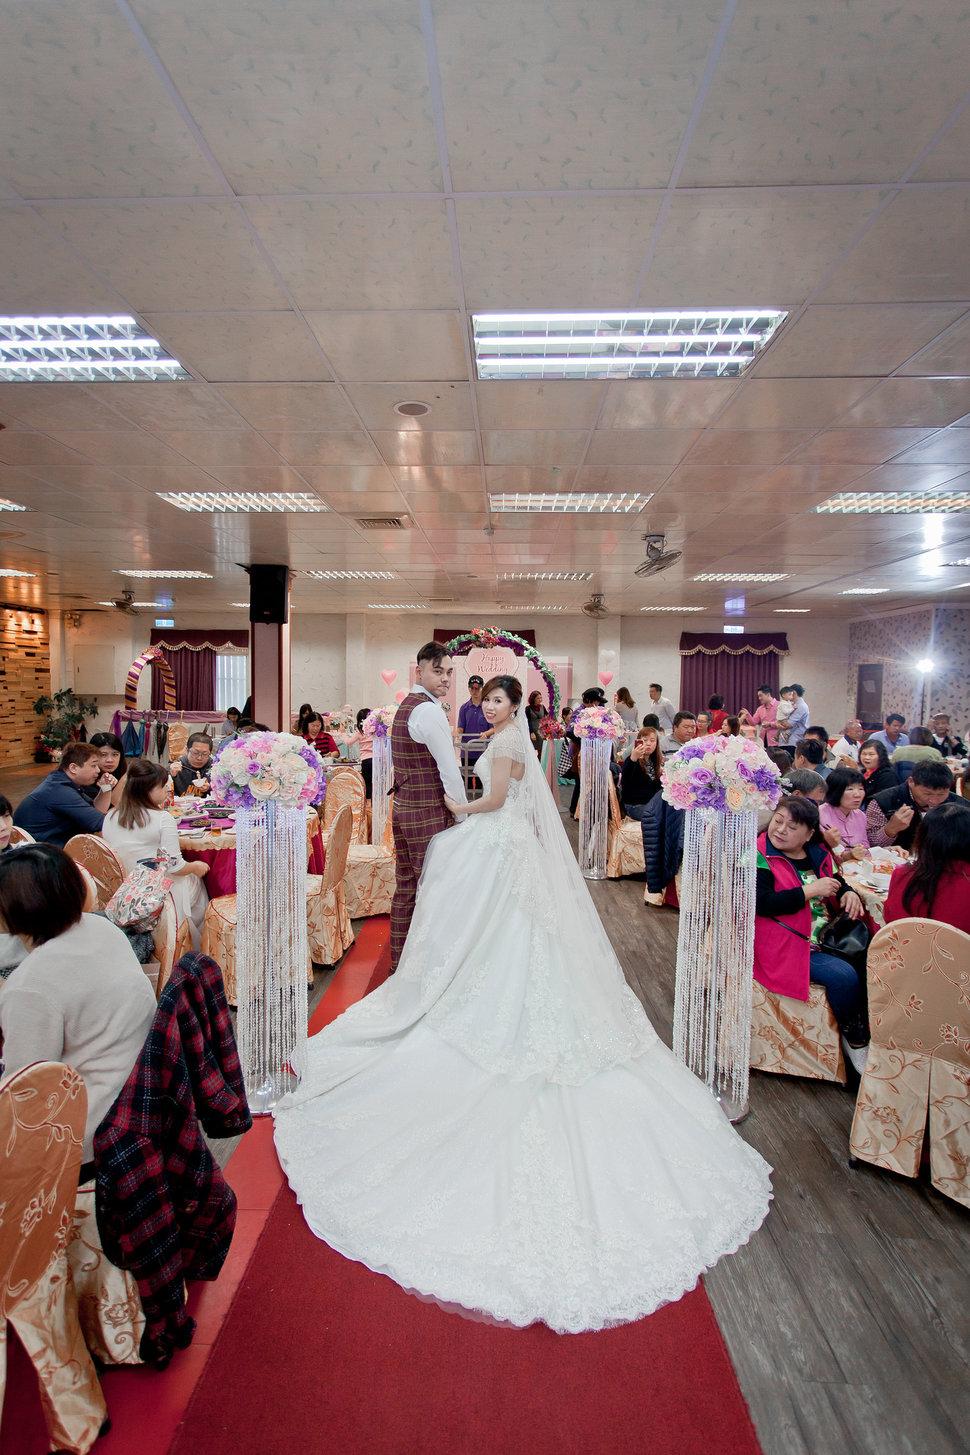 38645061821_c20825bbac_k - J Photographer《結婚吧》